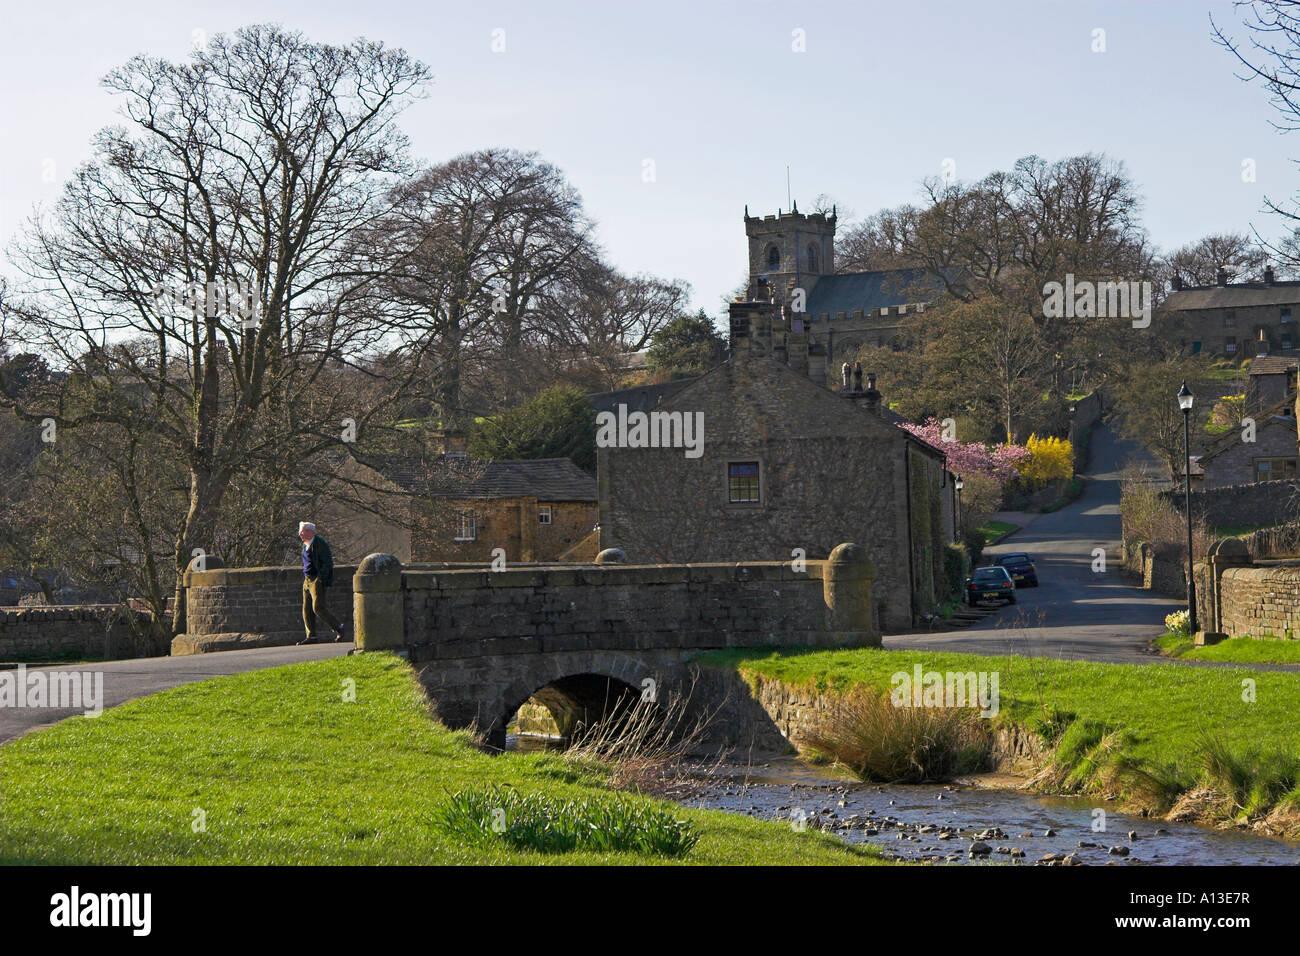 Downham village near Clitheroe, Ribble Valley, Lancashire, England - Stock Image